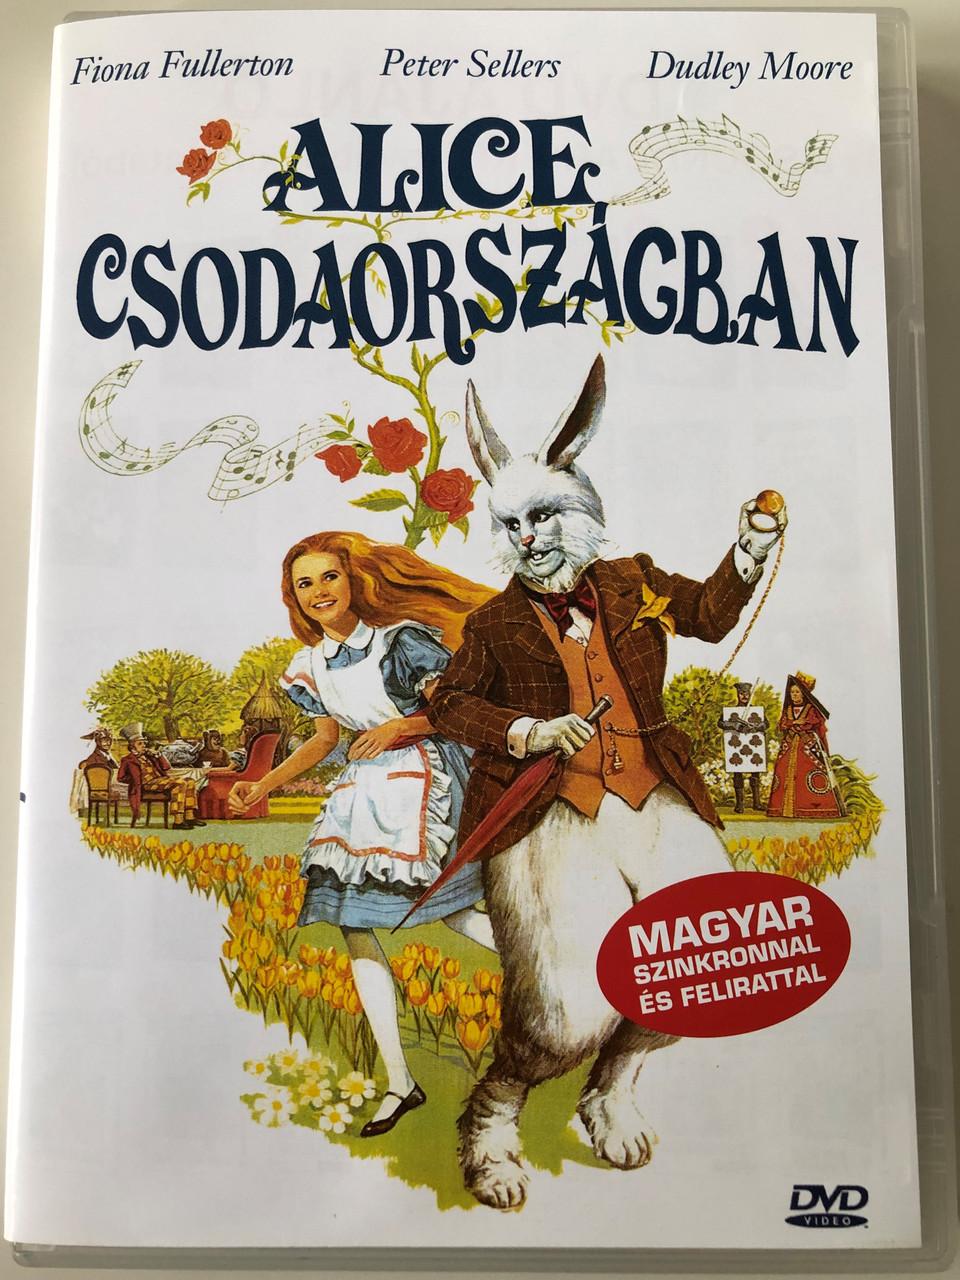 Alice's Adventures in Wonderland DVD 1972 Alice Csodaországban \/ Directed by William Sterling